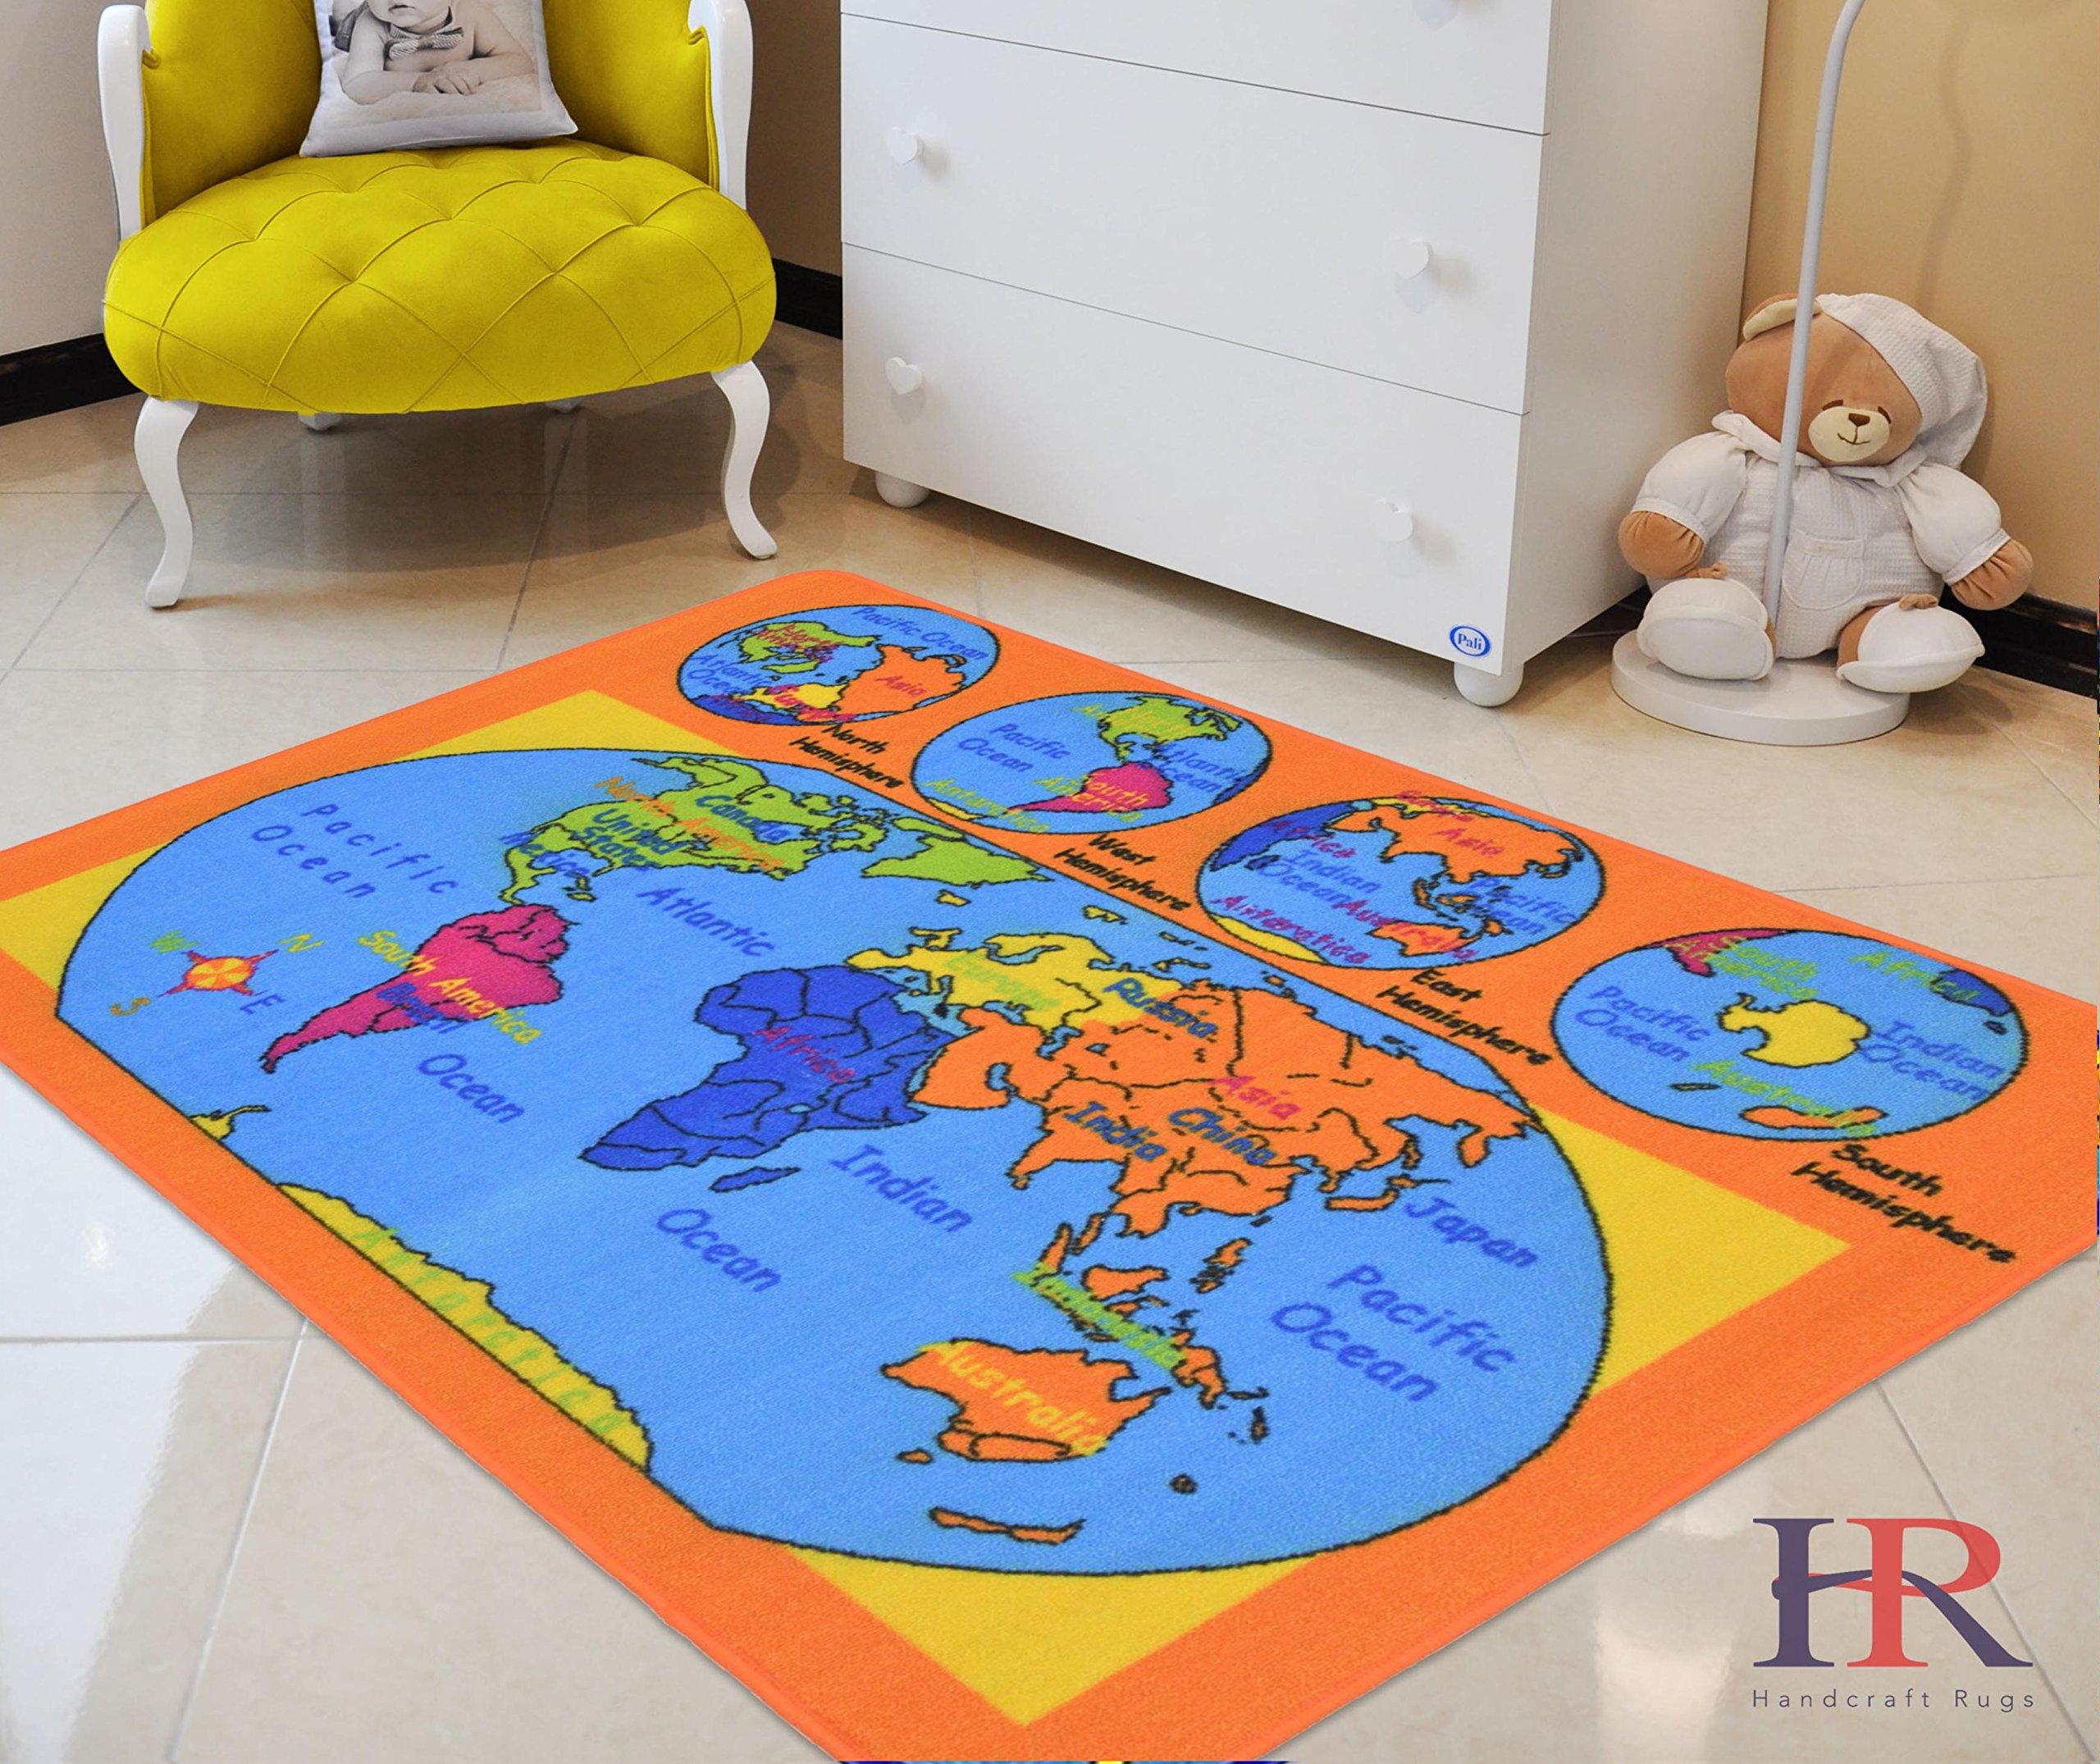 World Map Kids Educational Play mat for School/Classroom / Kids Room/Daycare/ Nursery Non-Slip Gel Back Rug Carpet-(5 by 7 feet)